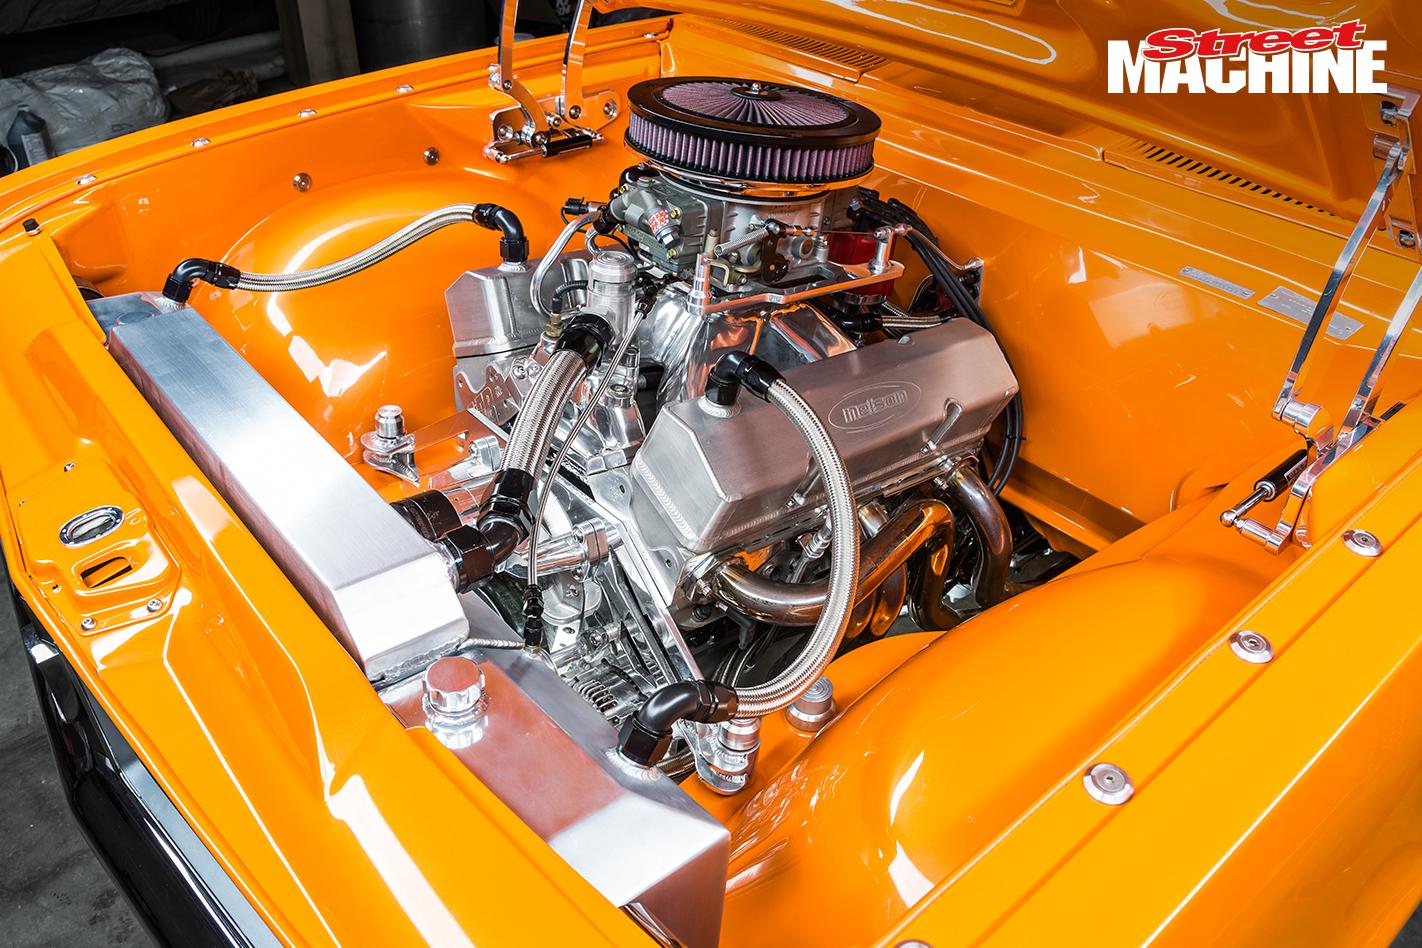 441 Cube Nelson Racing Engines Powered Elite Level Hg Monaro